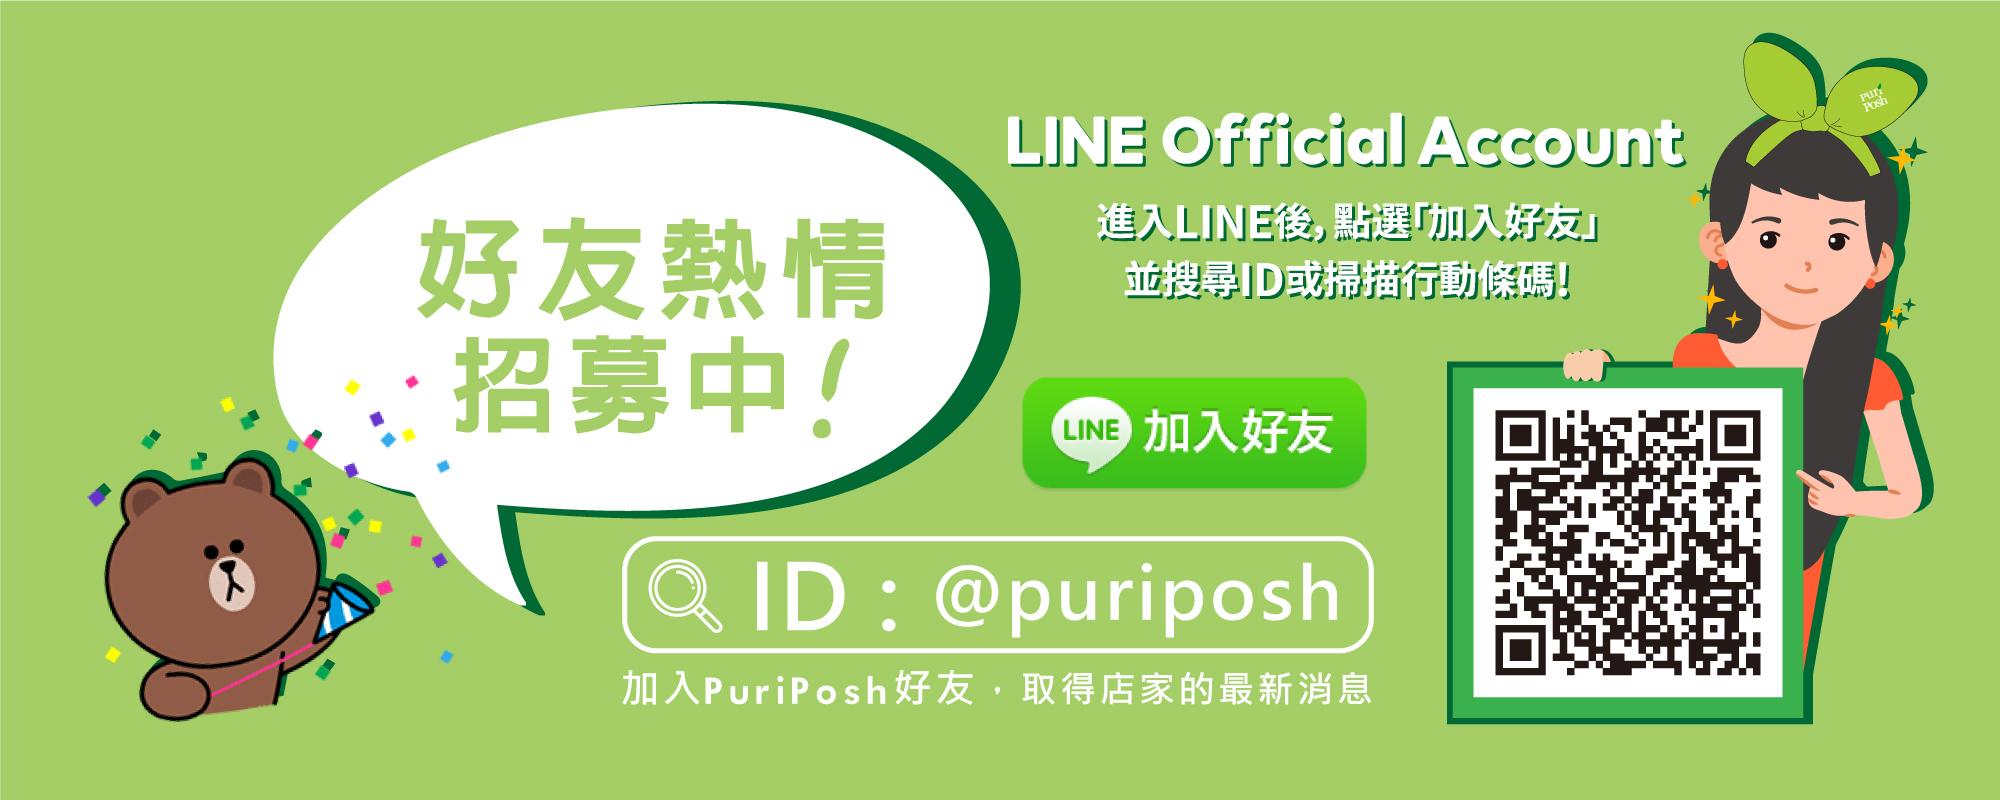 加入官方LINE@好友